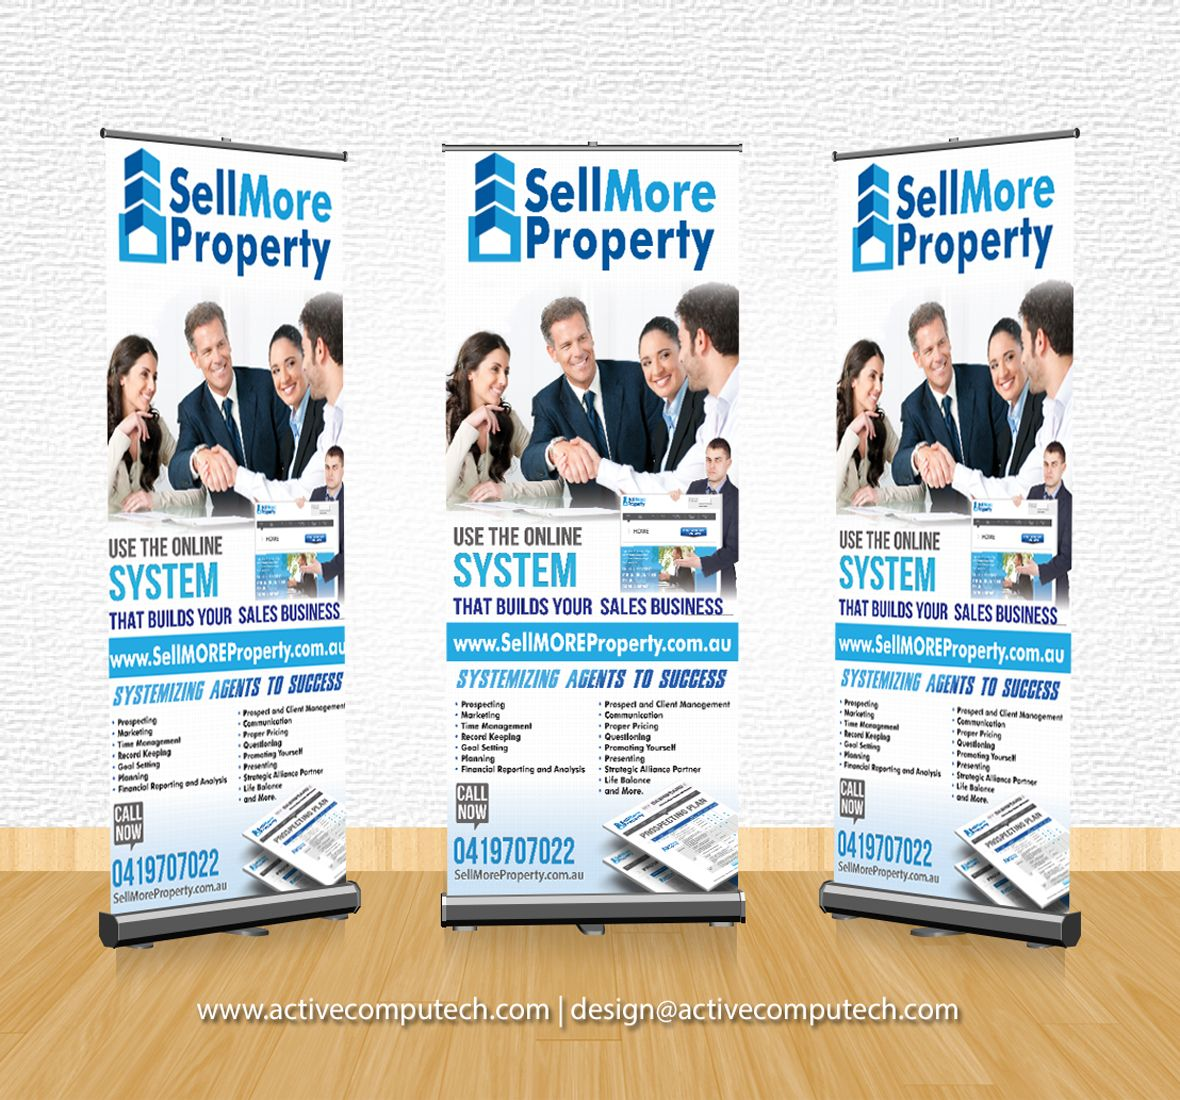 Rollup Banner Designs Visit Www Activecomputech Com Send Your Design Requirements To Design Activecomputech Com Pendon